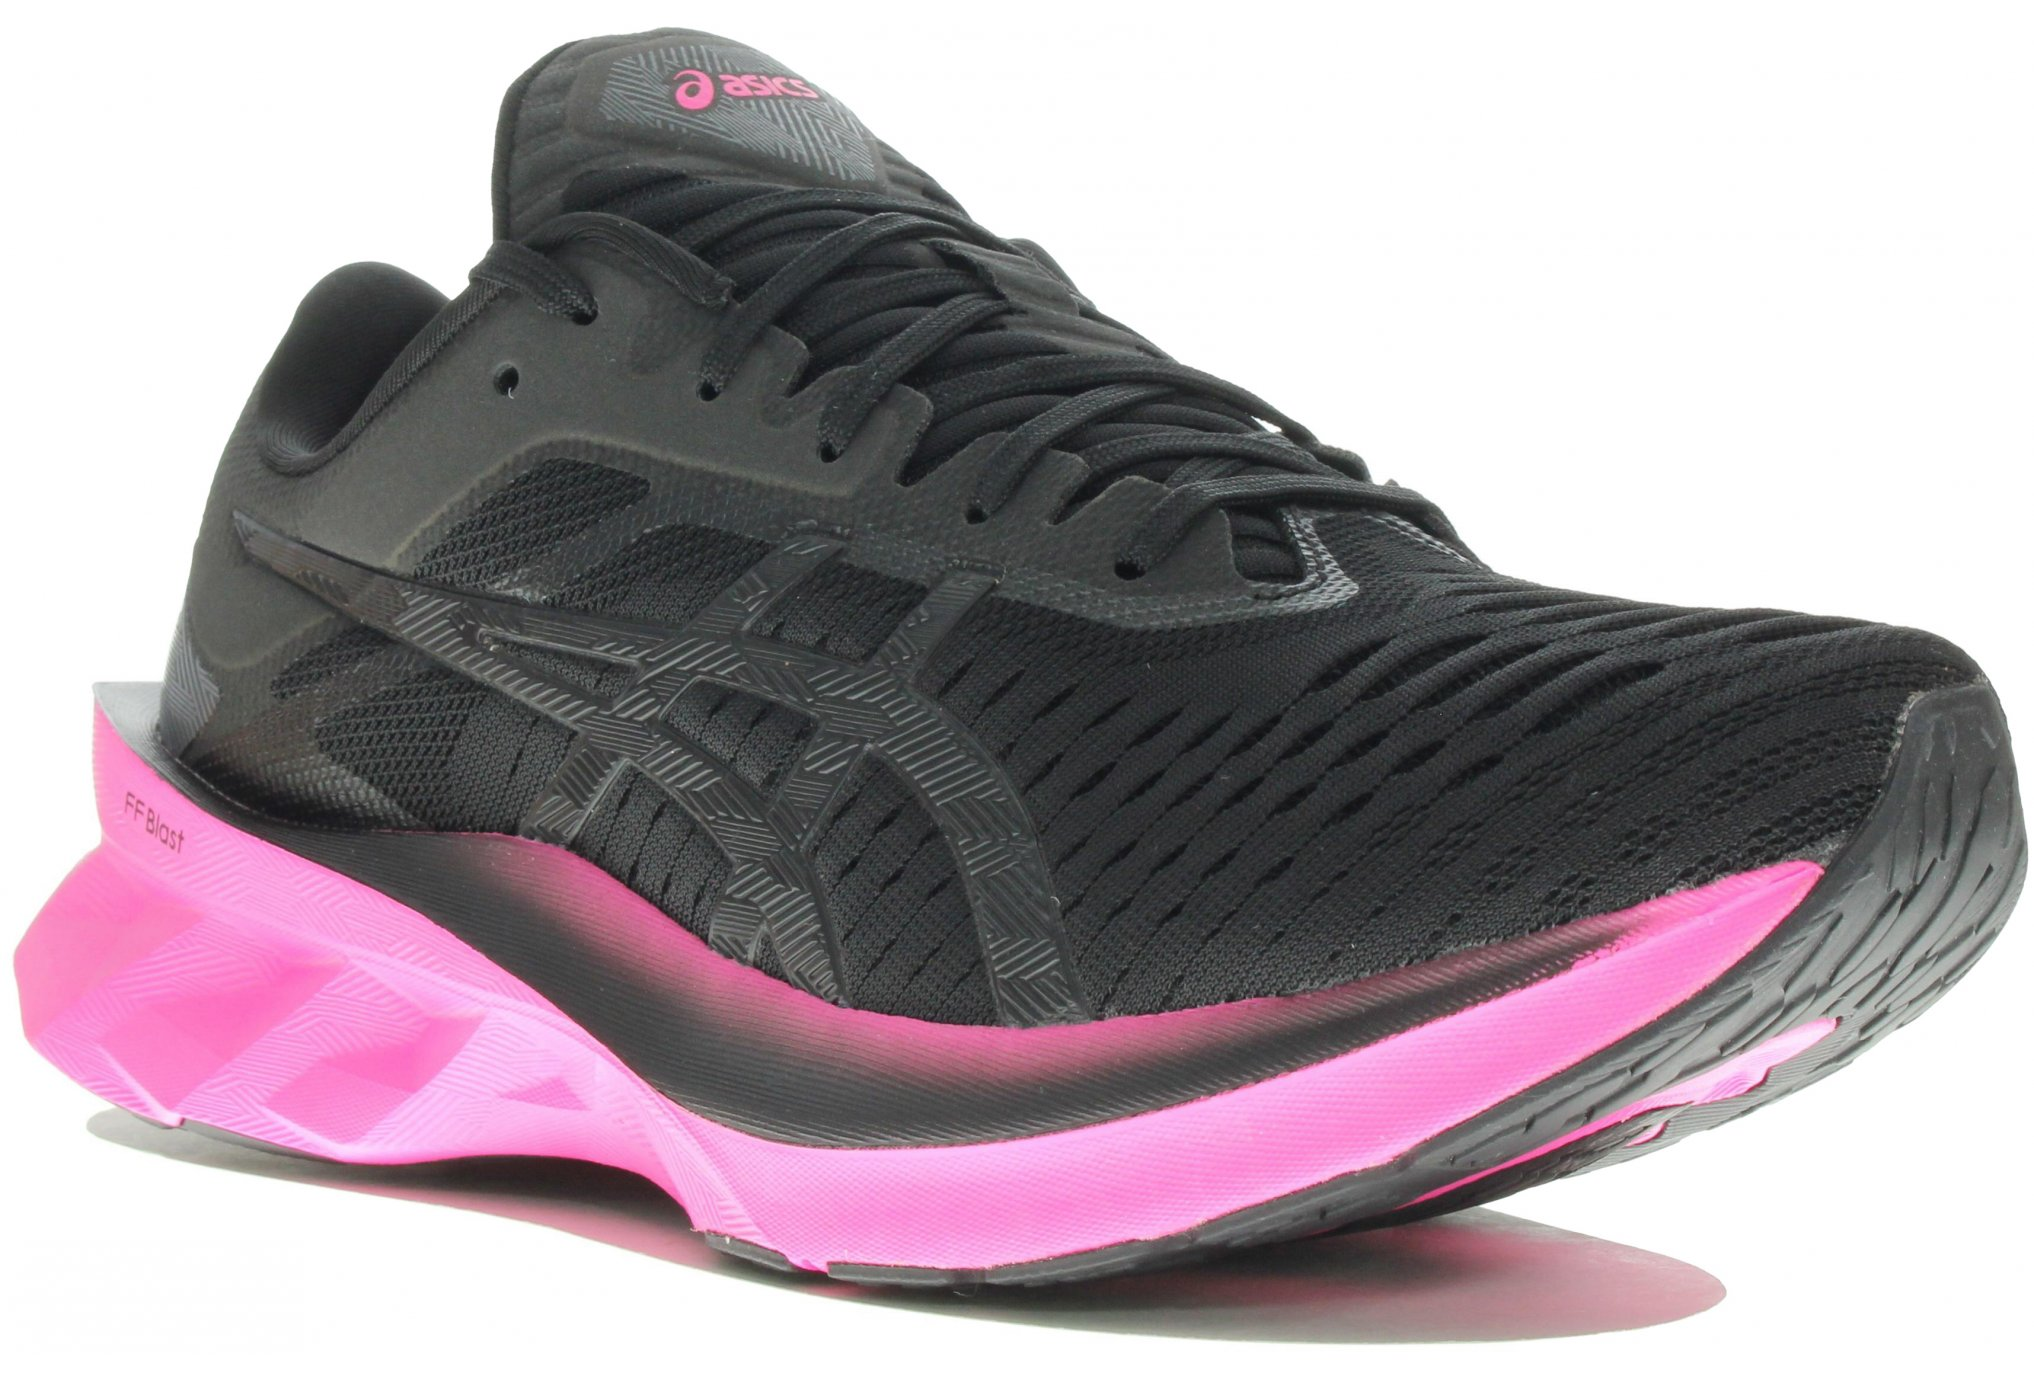 Asics Novablast Chaussures running femme